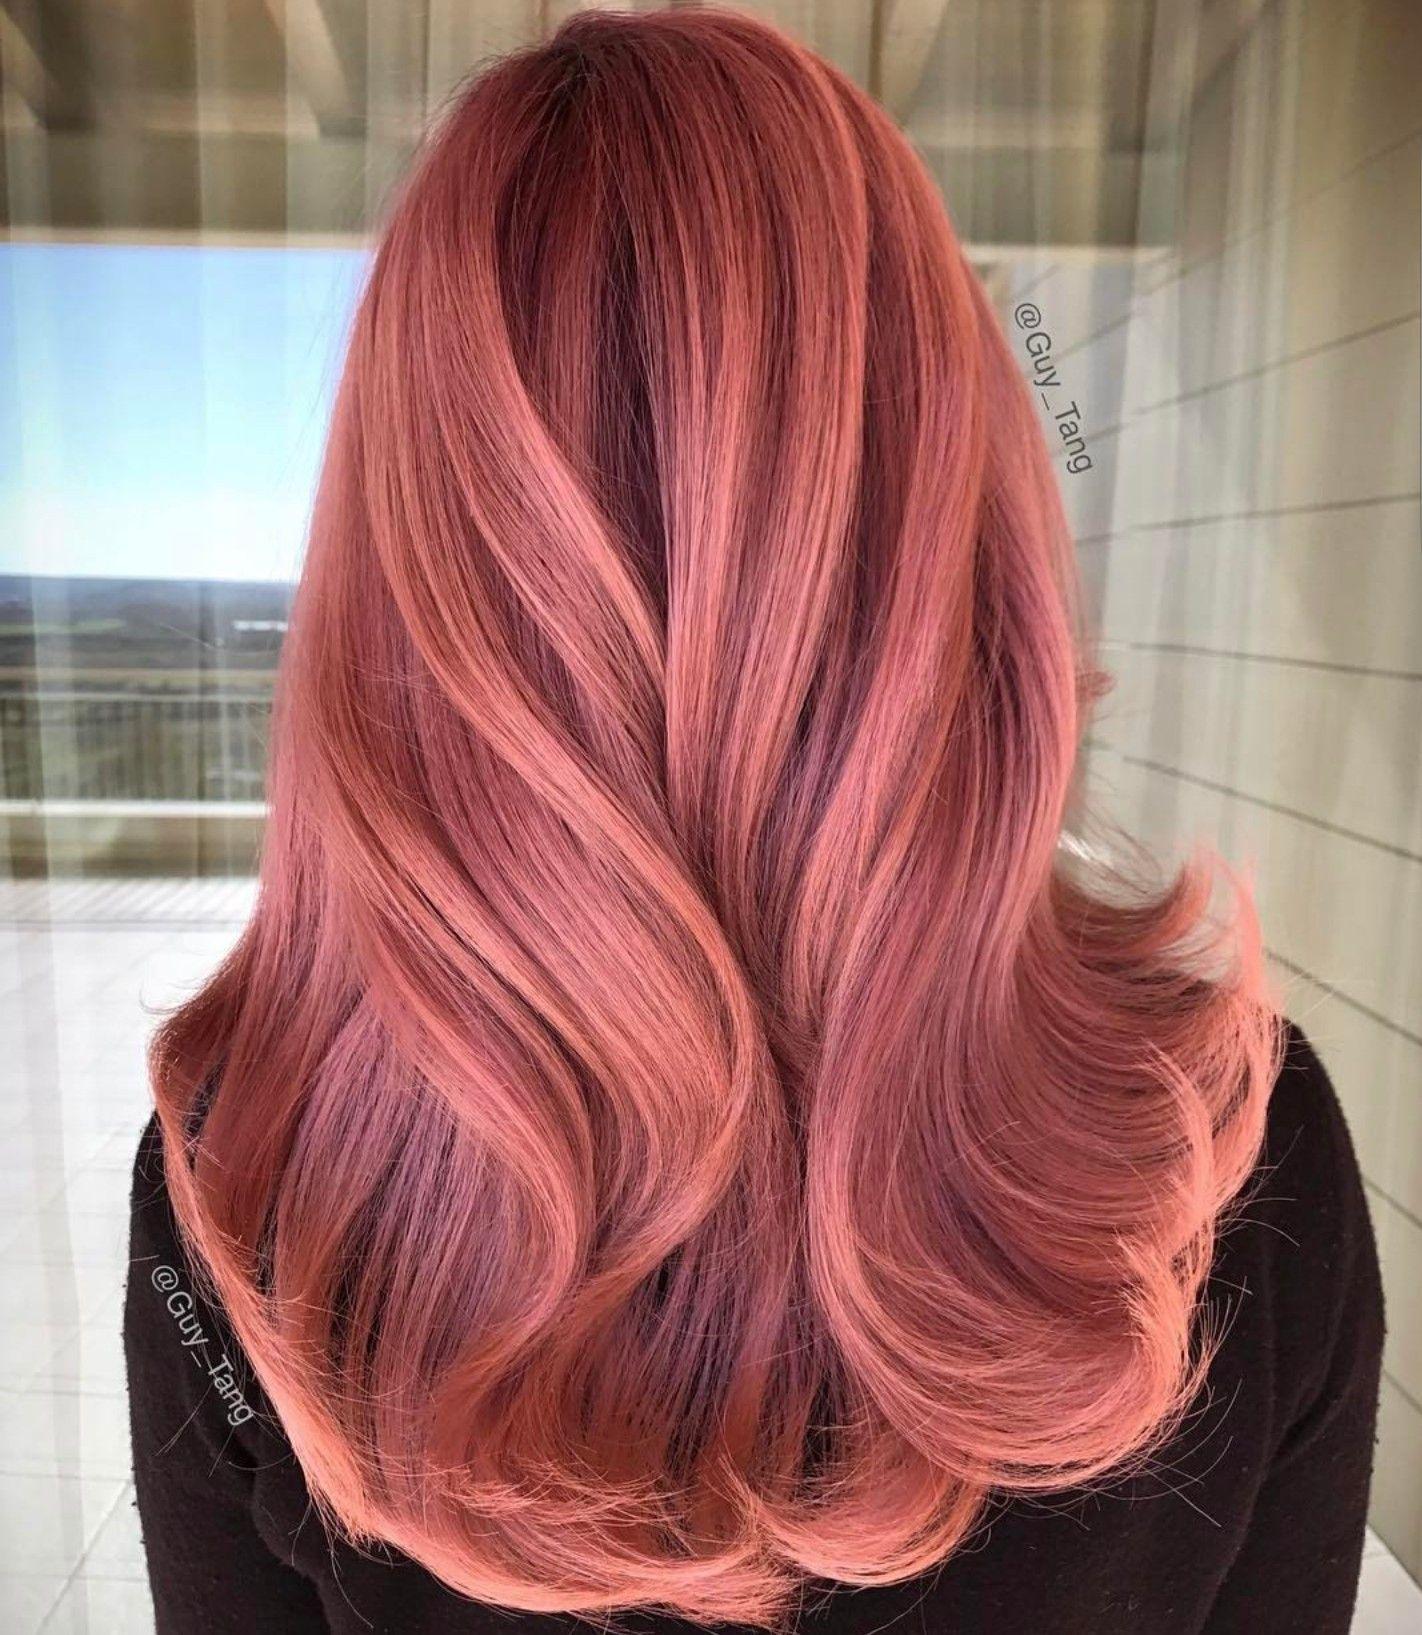 Pin By Kati Szorcsik On Frizura Pinterest Hair Coloring Hair